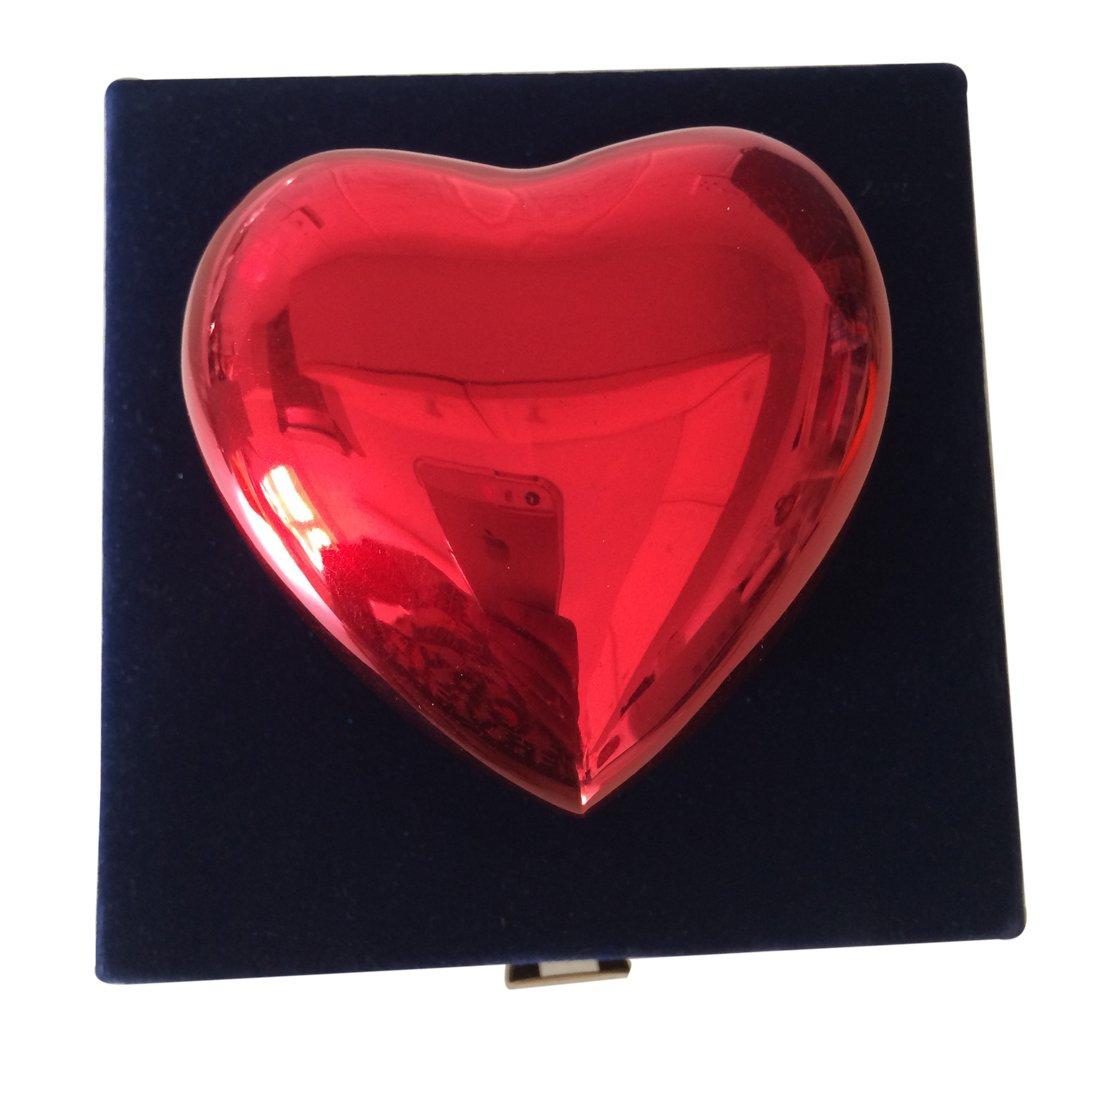 Classic Red Heart Keepsake Urn, Memorial Urns